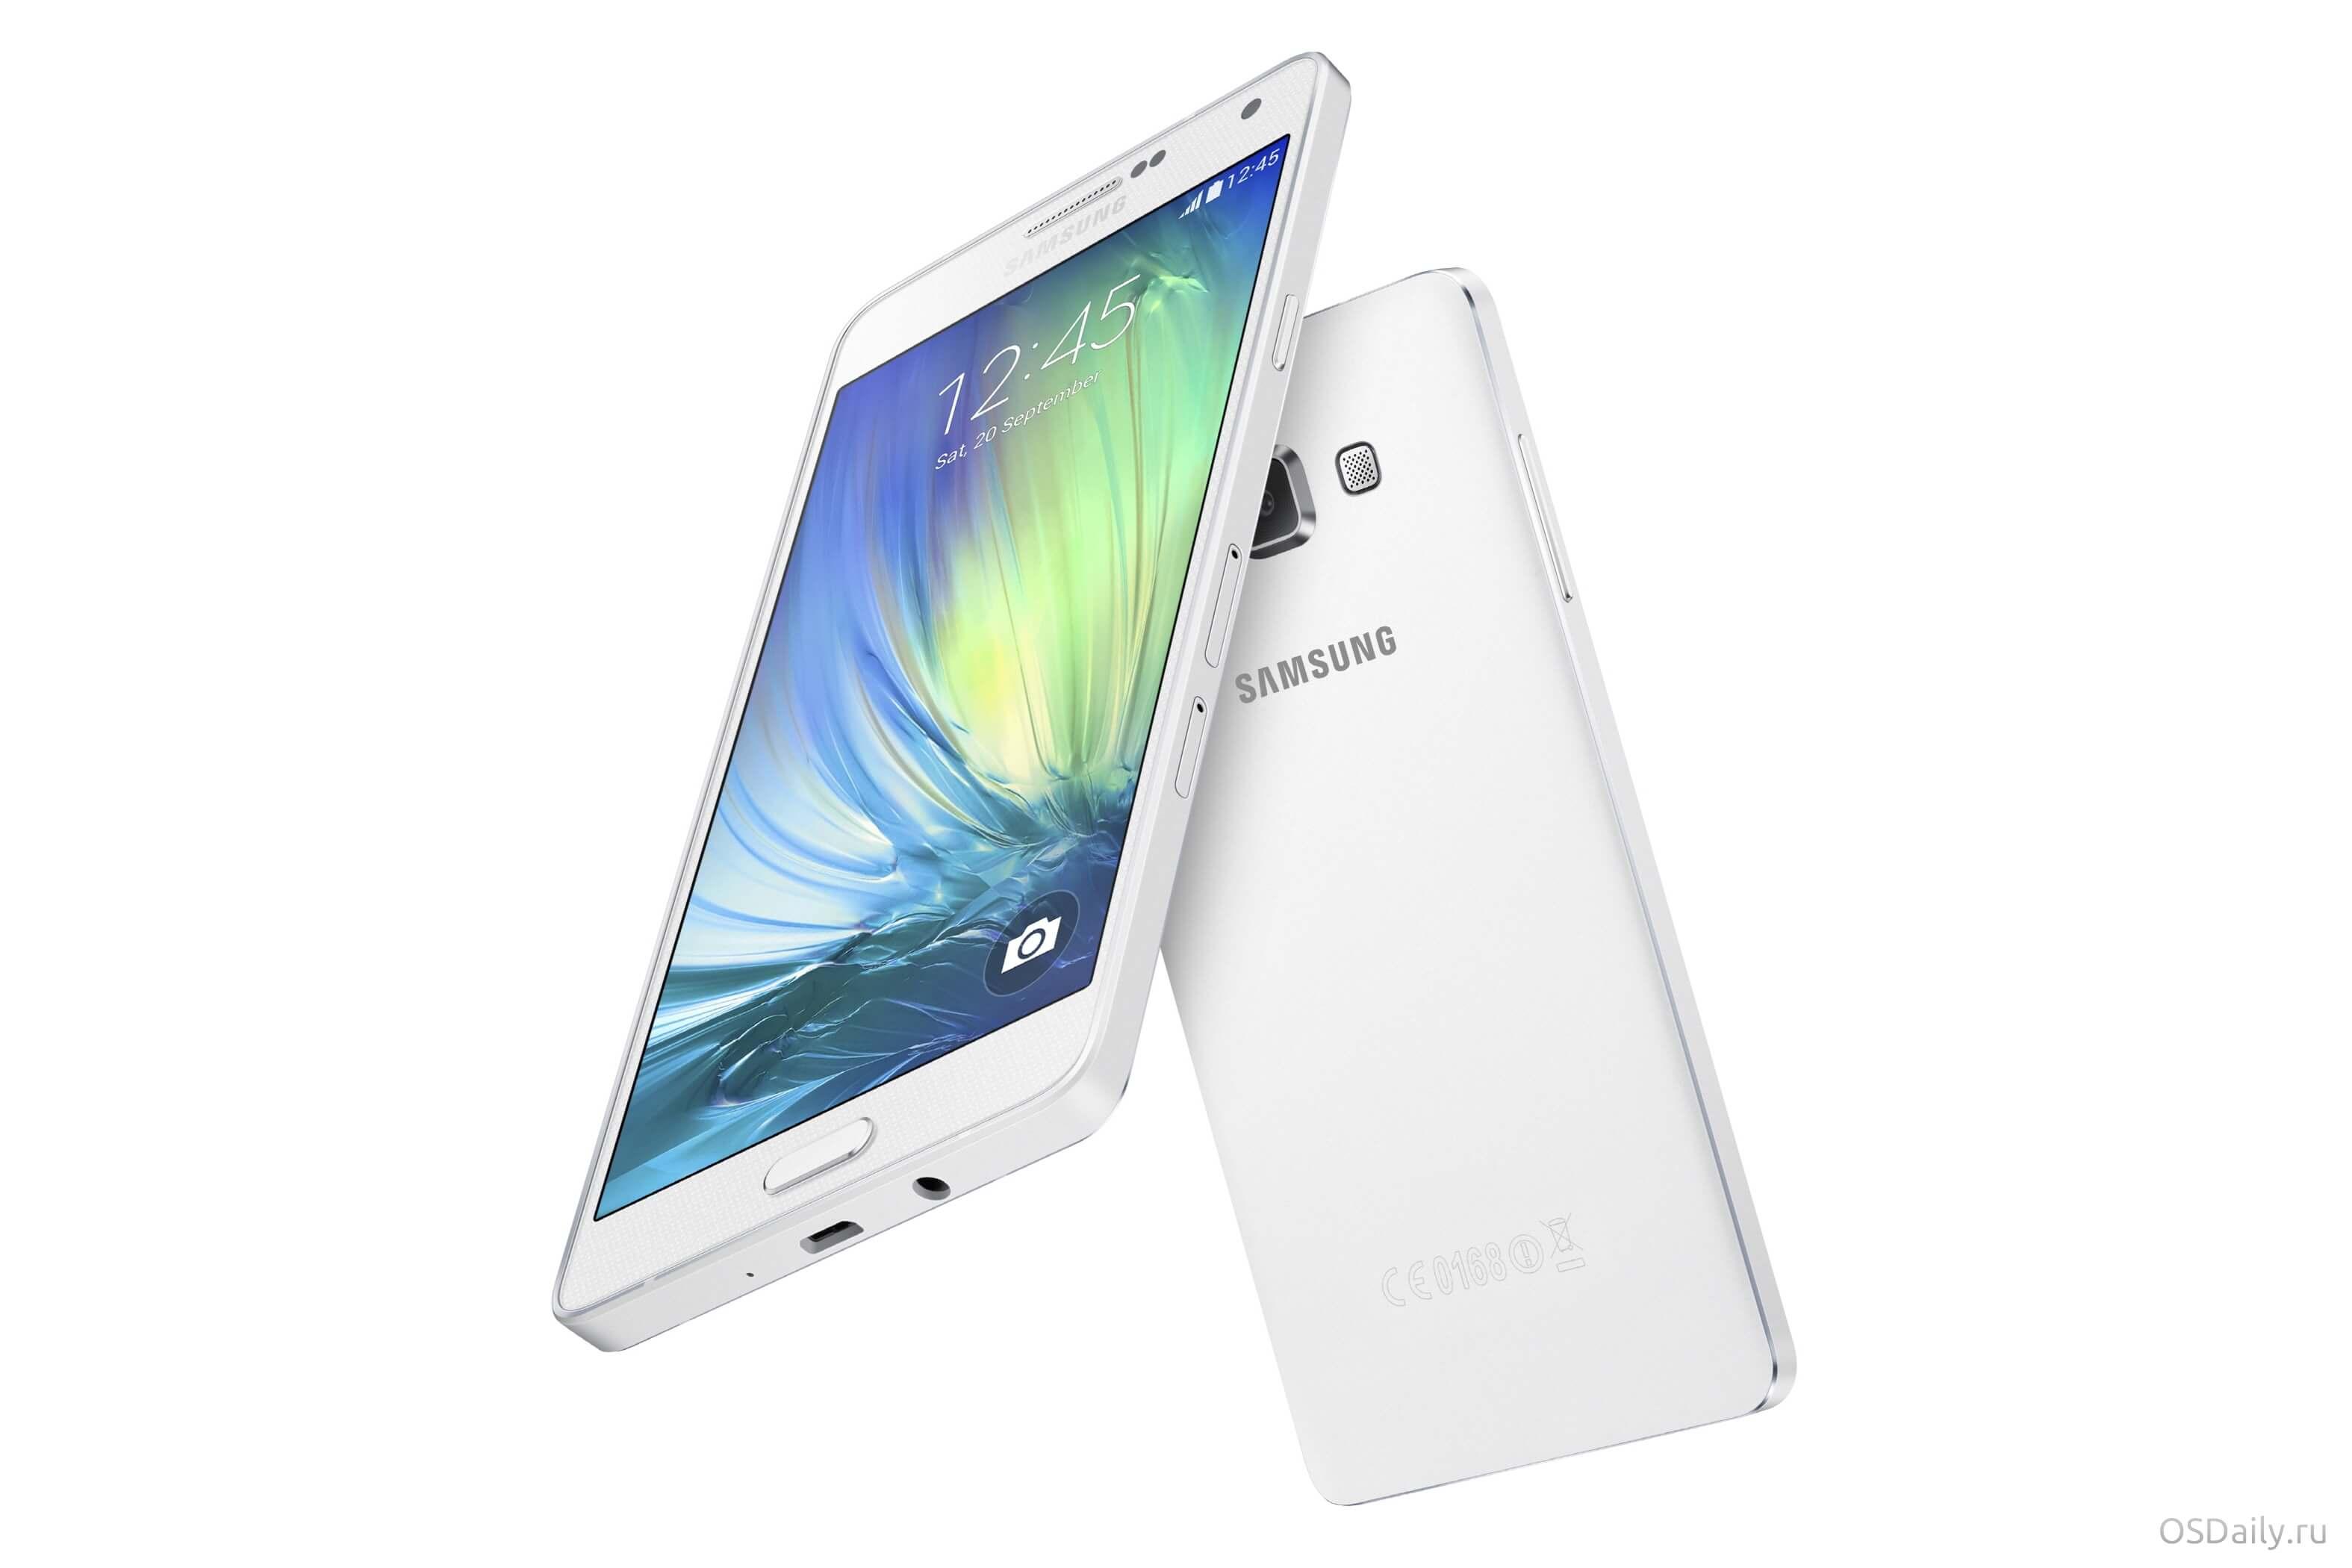 Samsung Galaxy А7 (2017) технические характеристики